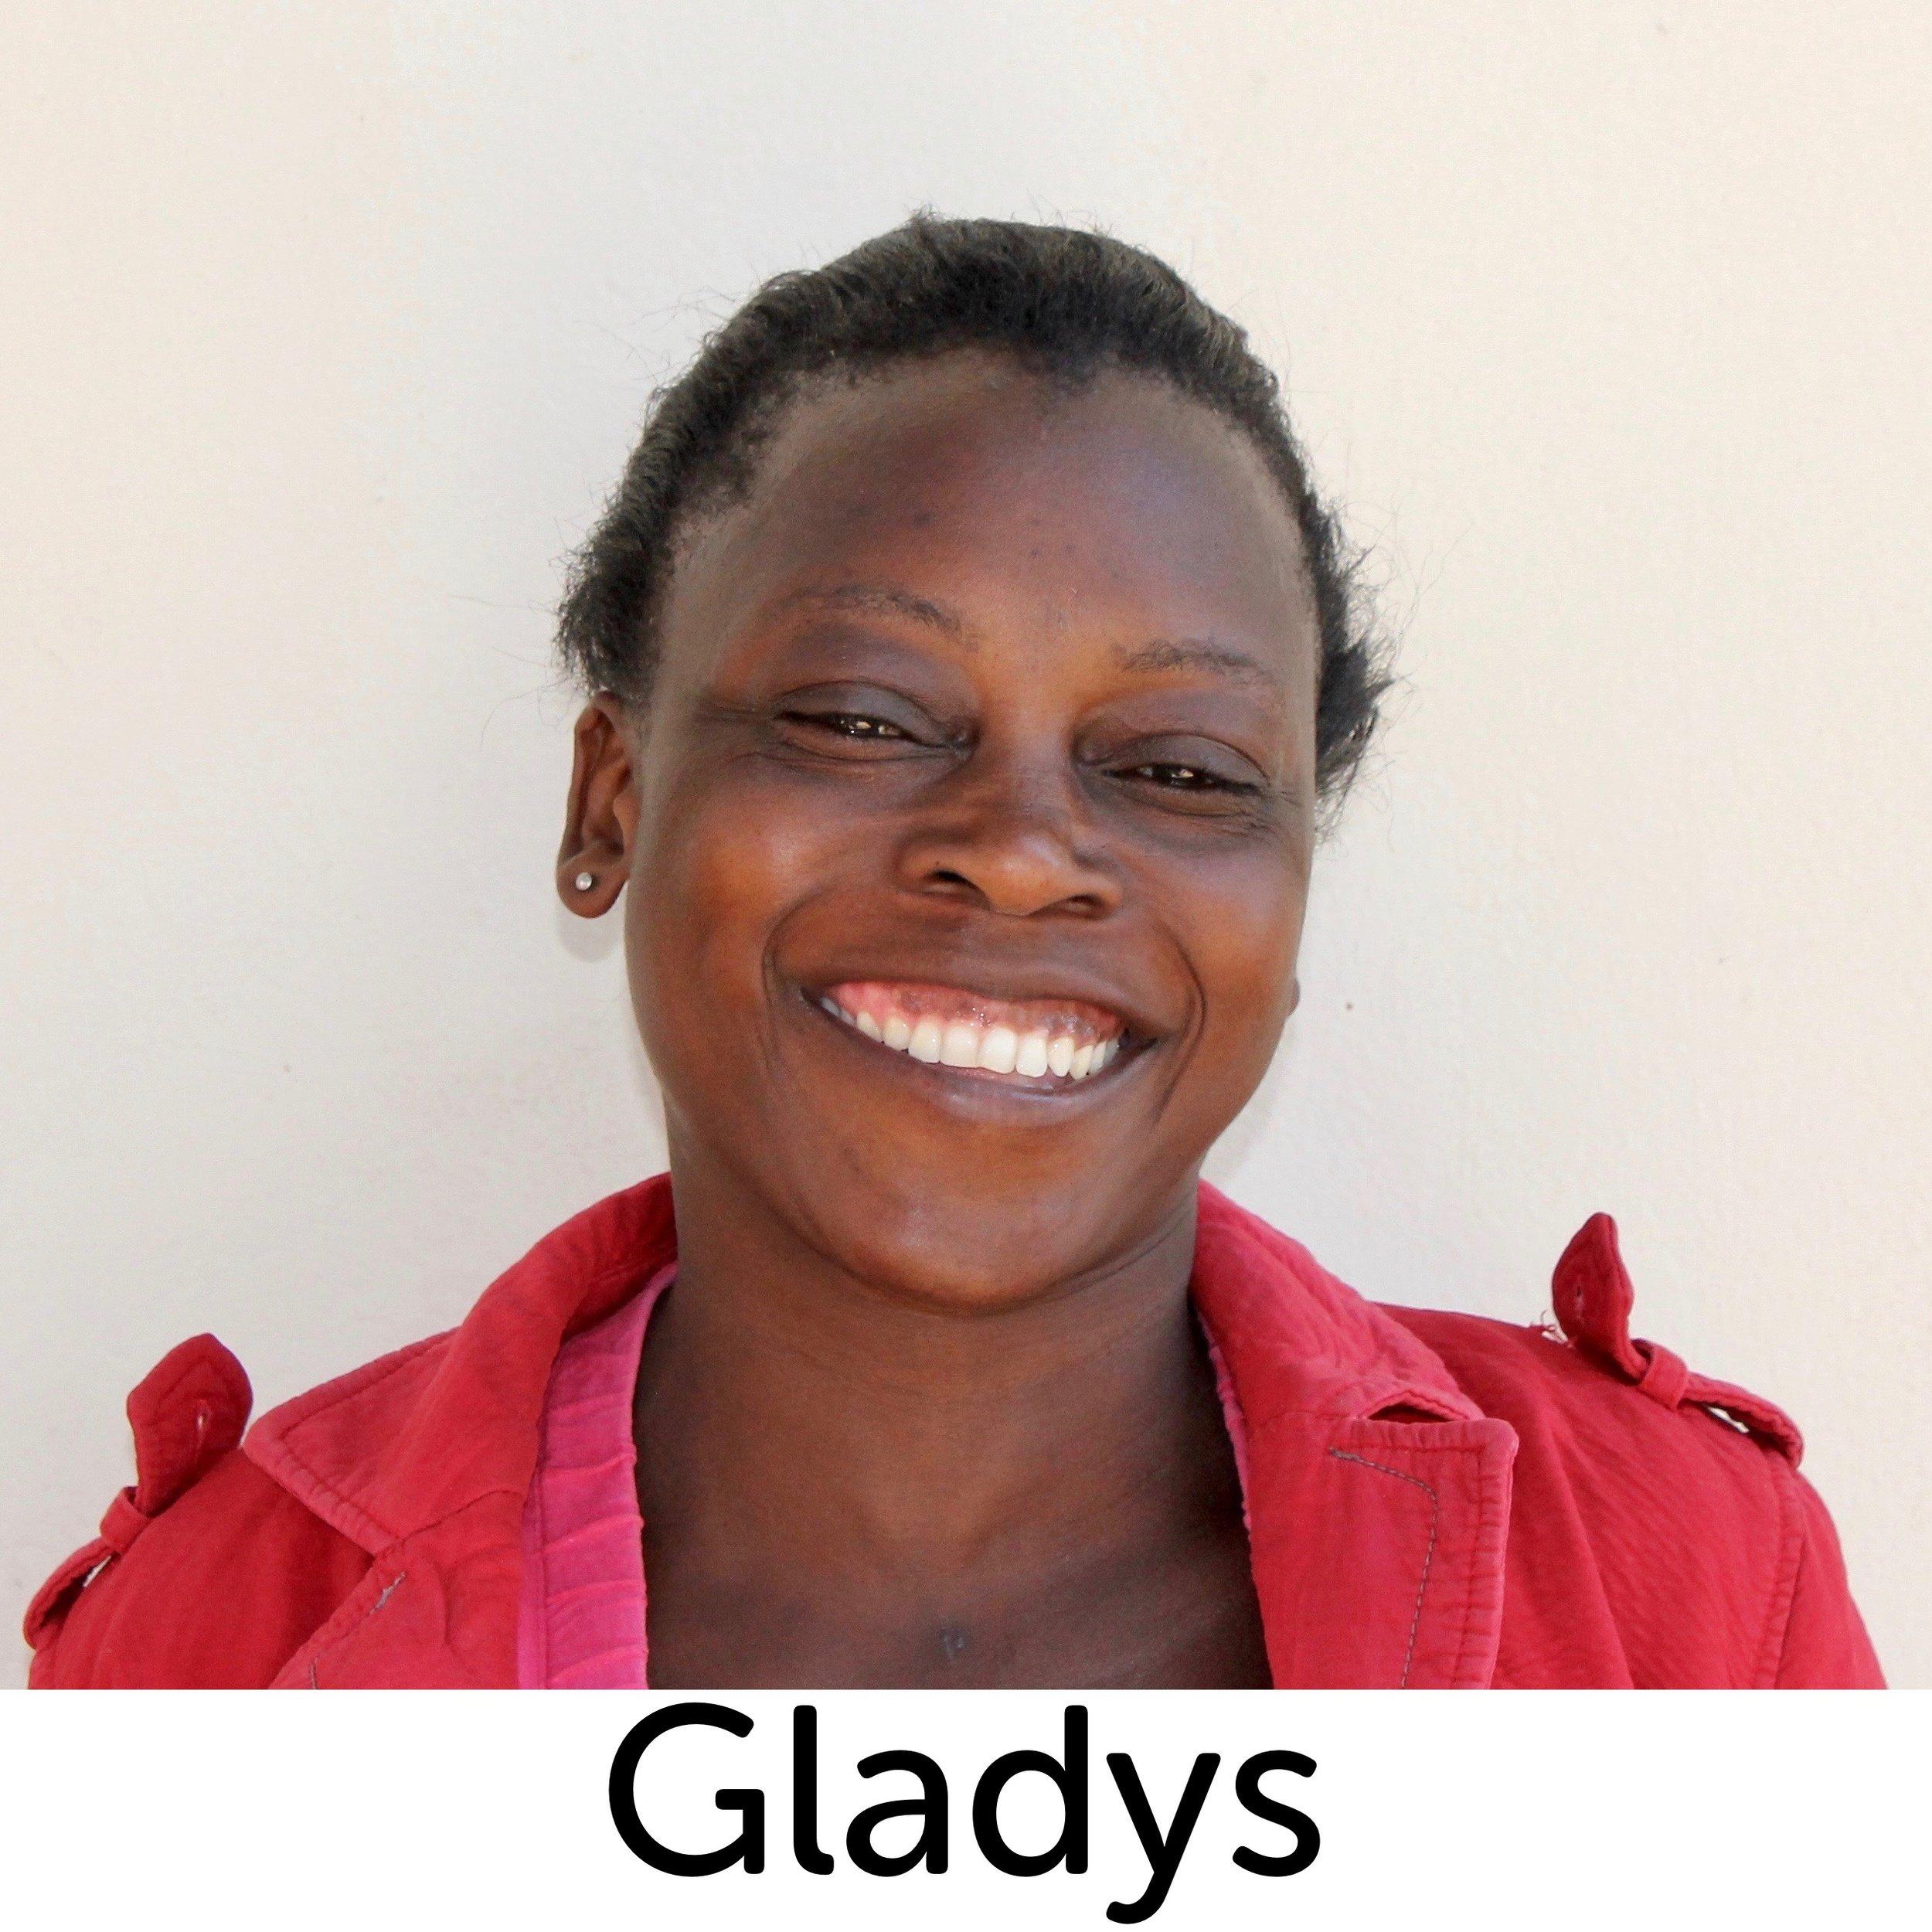 HOM Gladys 2.jpg